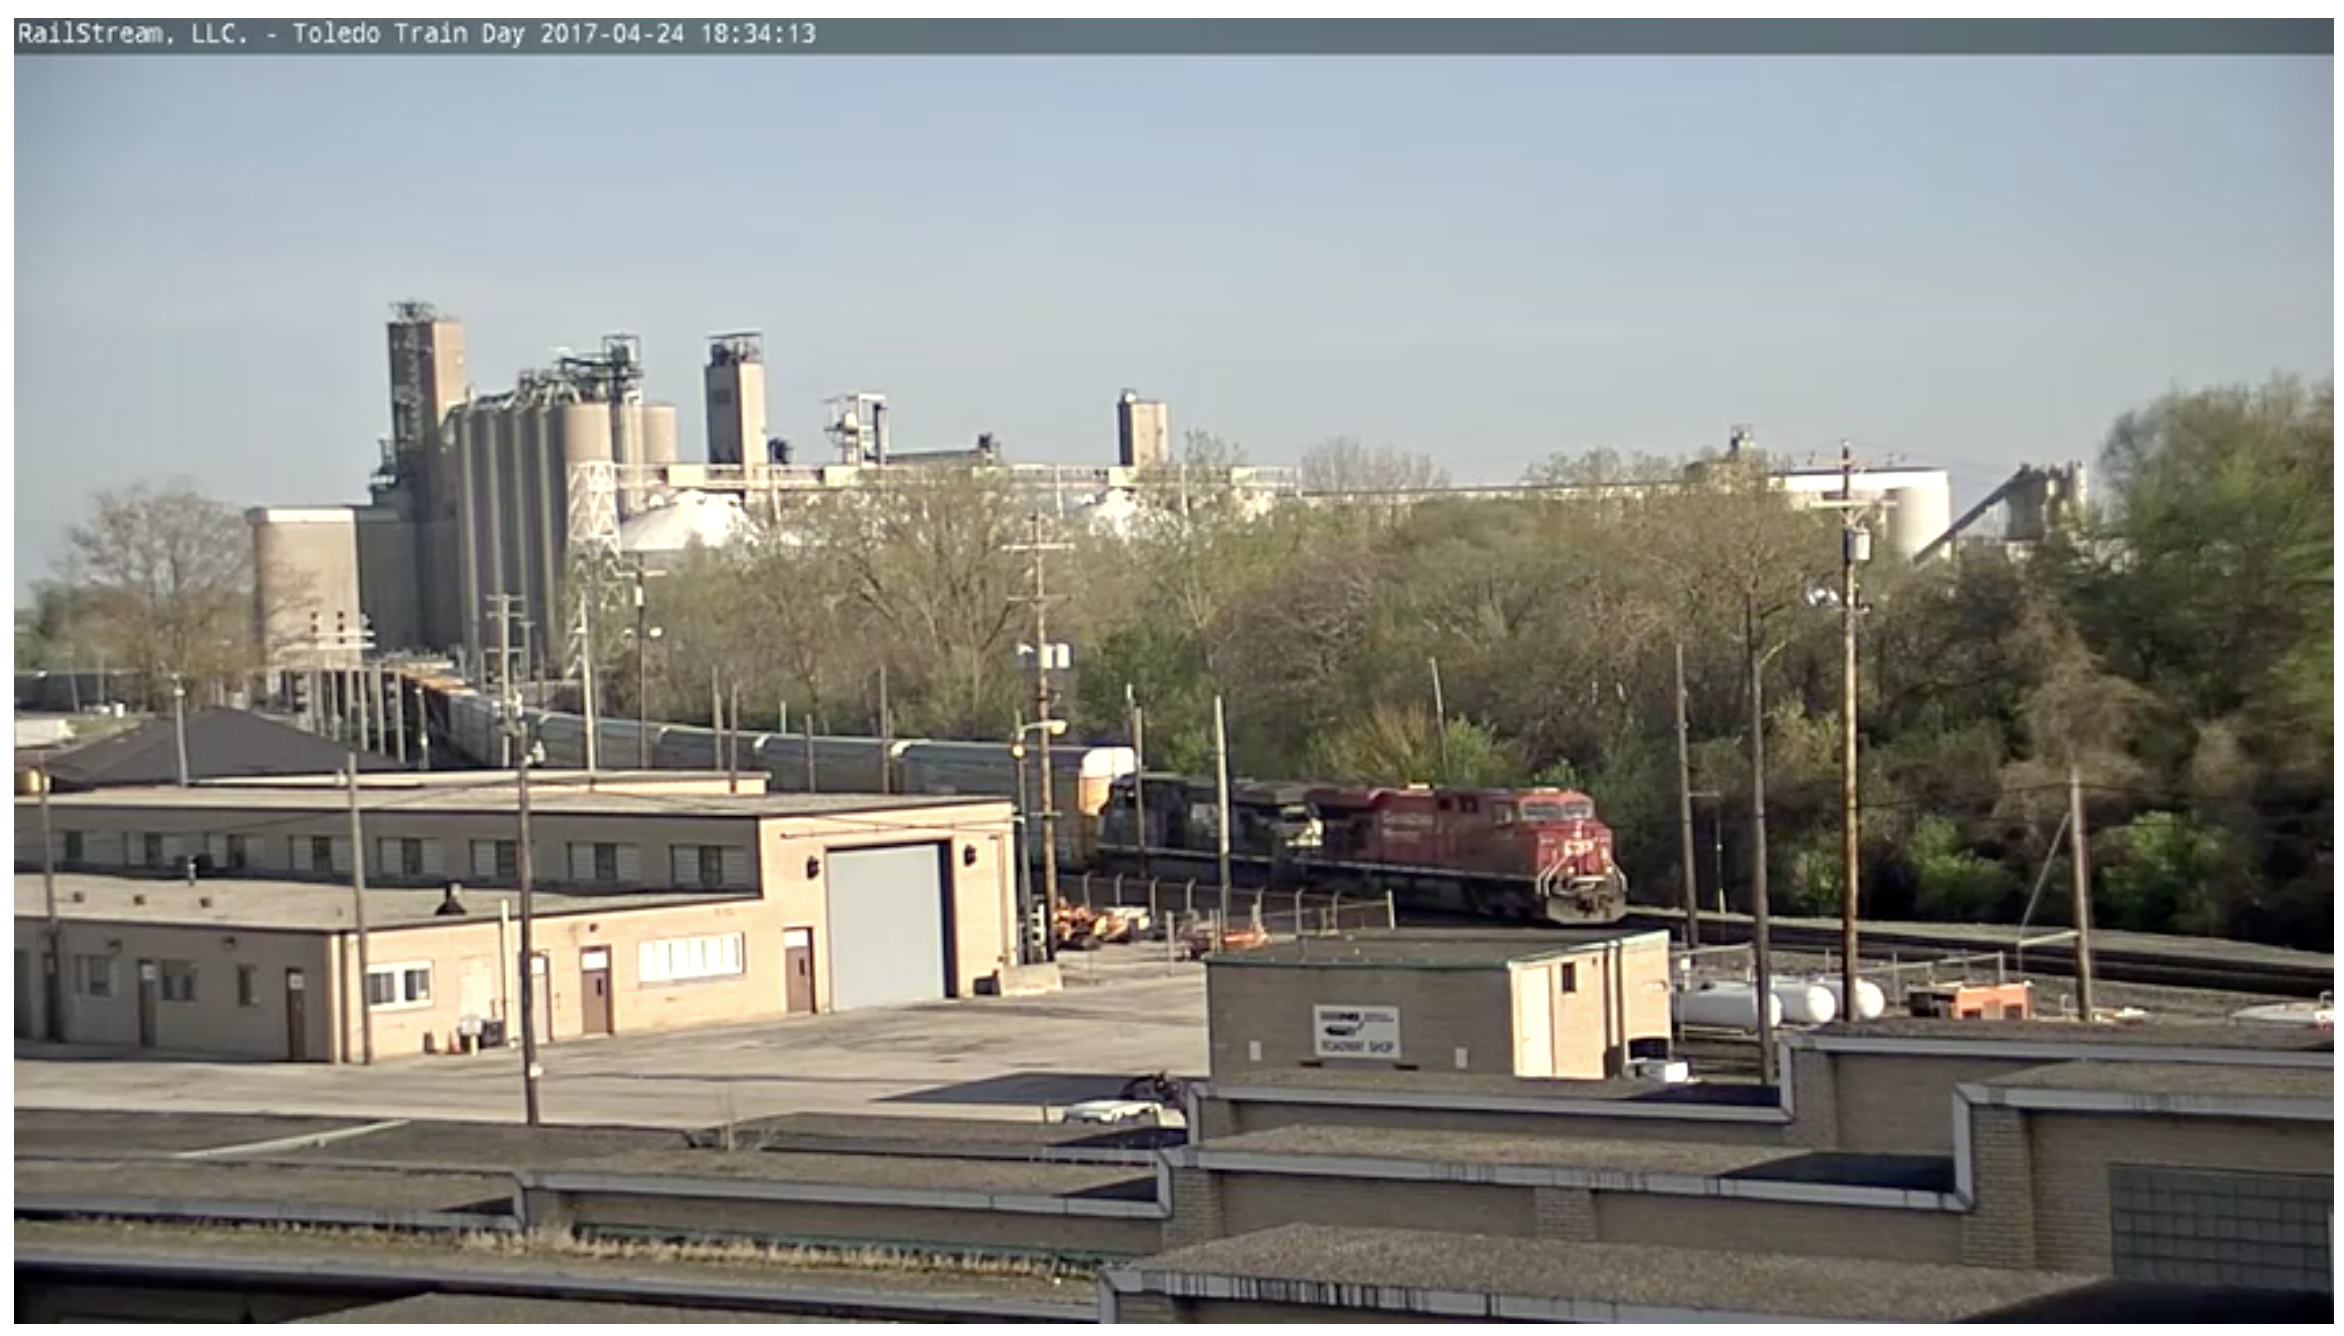 Toledo, OH Train Day